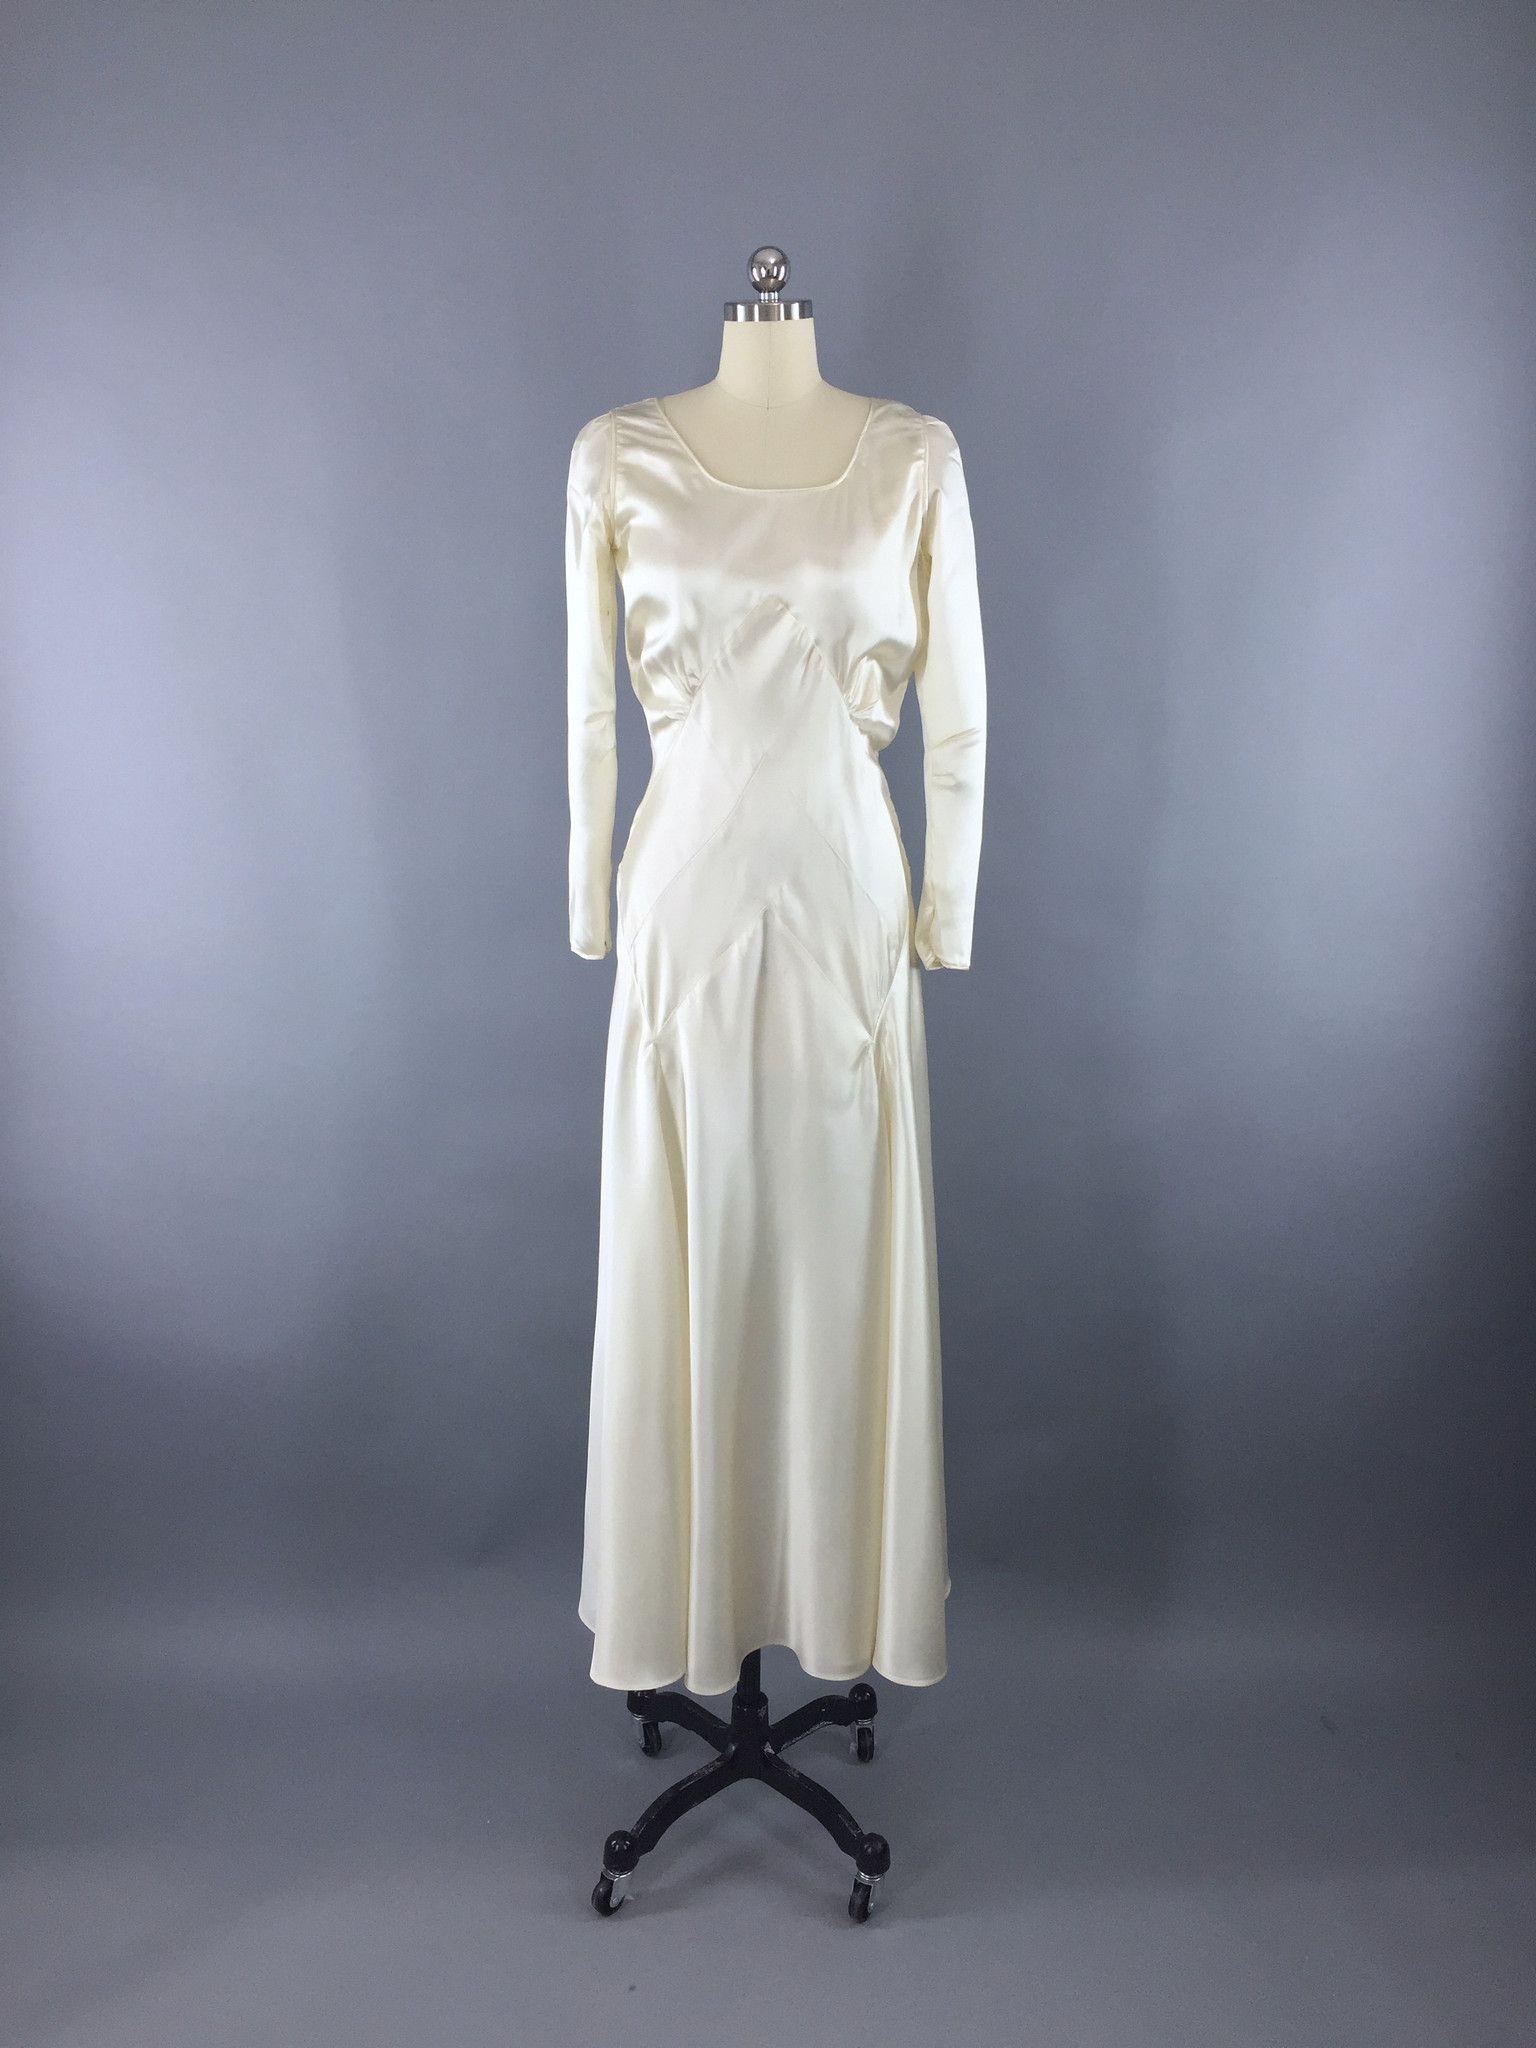 1930s wedding dress  Vintage s  s Art Deco Satin Bridal Dress with Slip Bra and